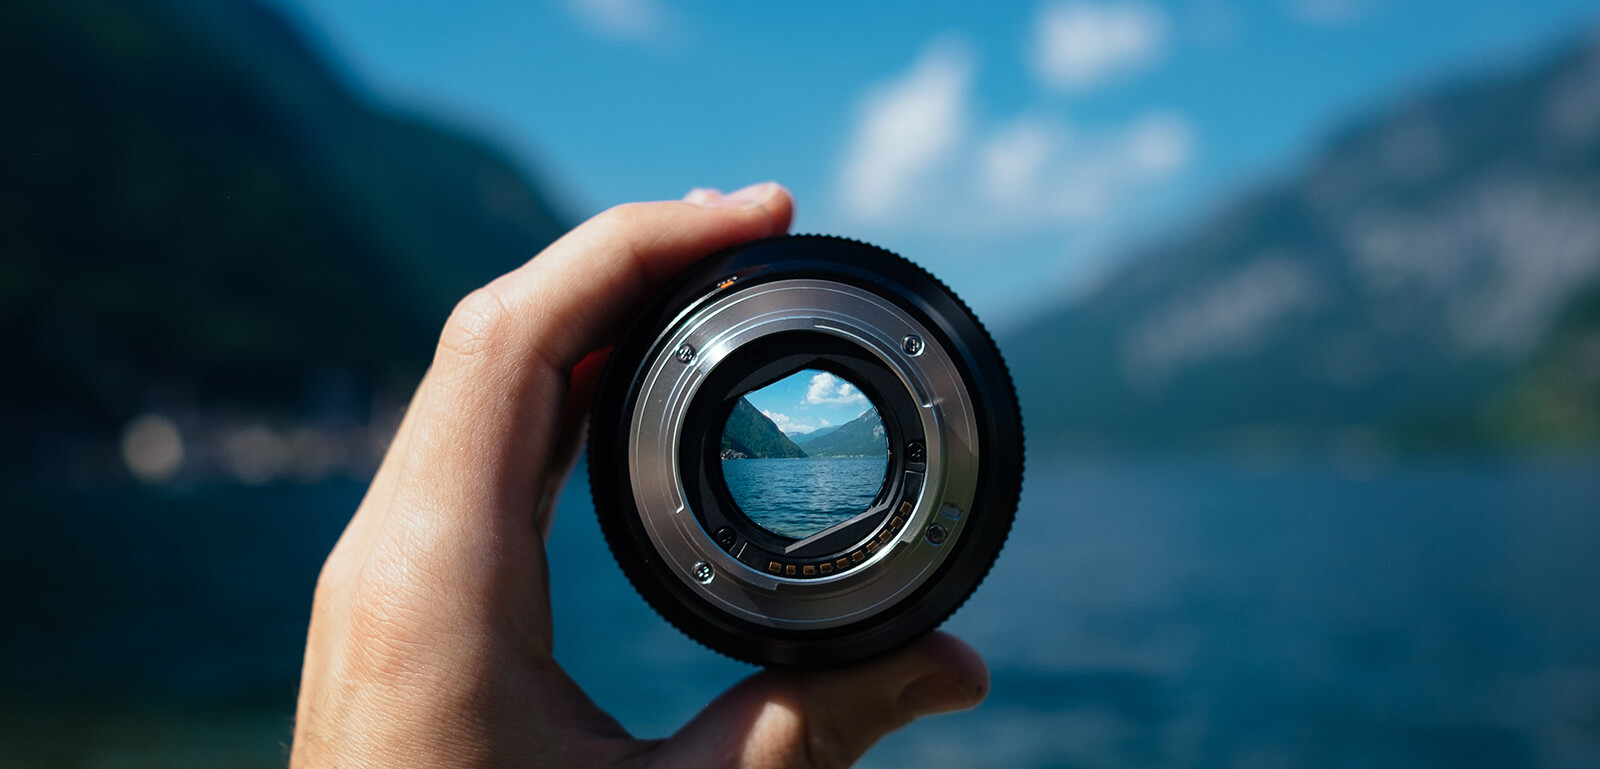 business planning, strategic advisory, risk management